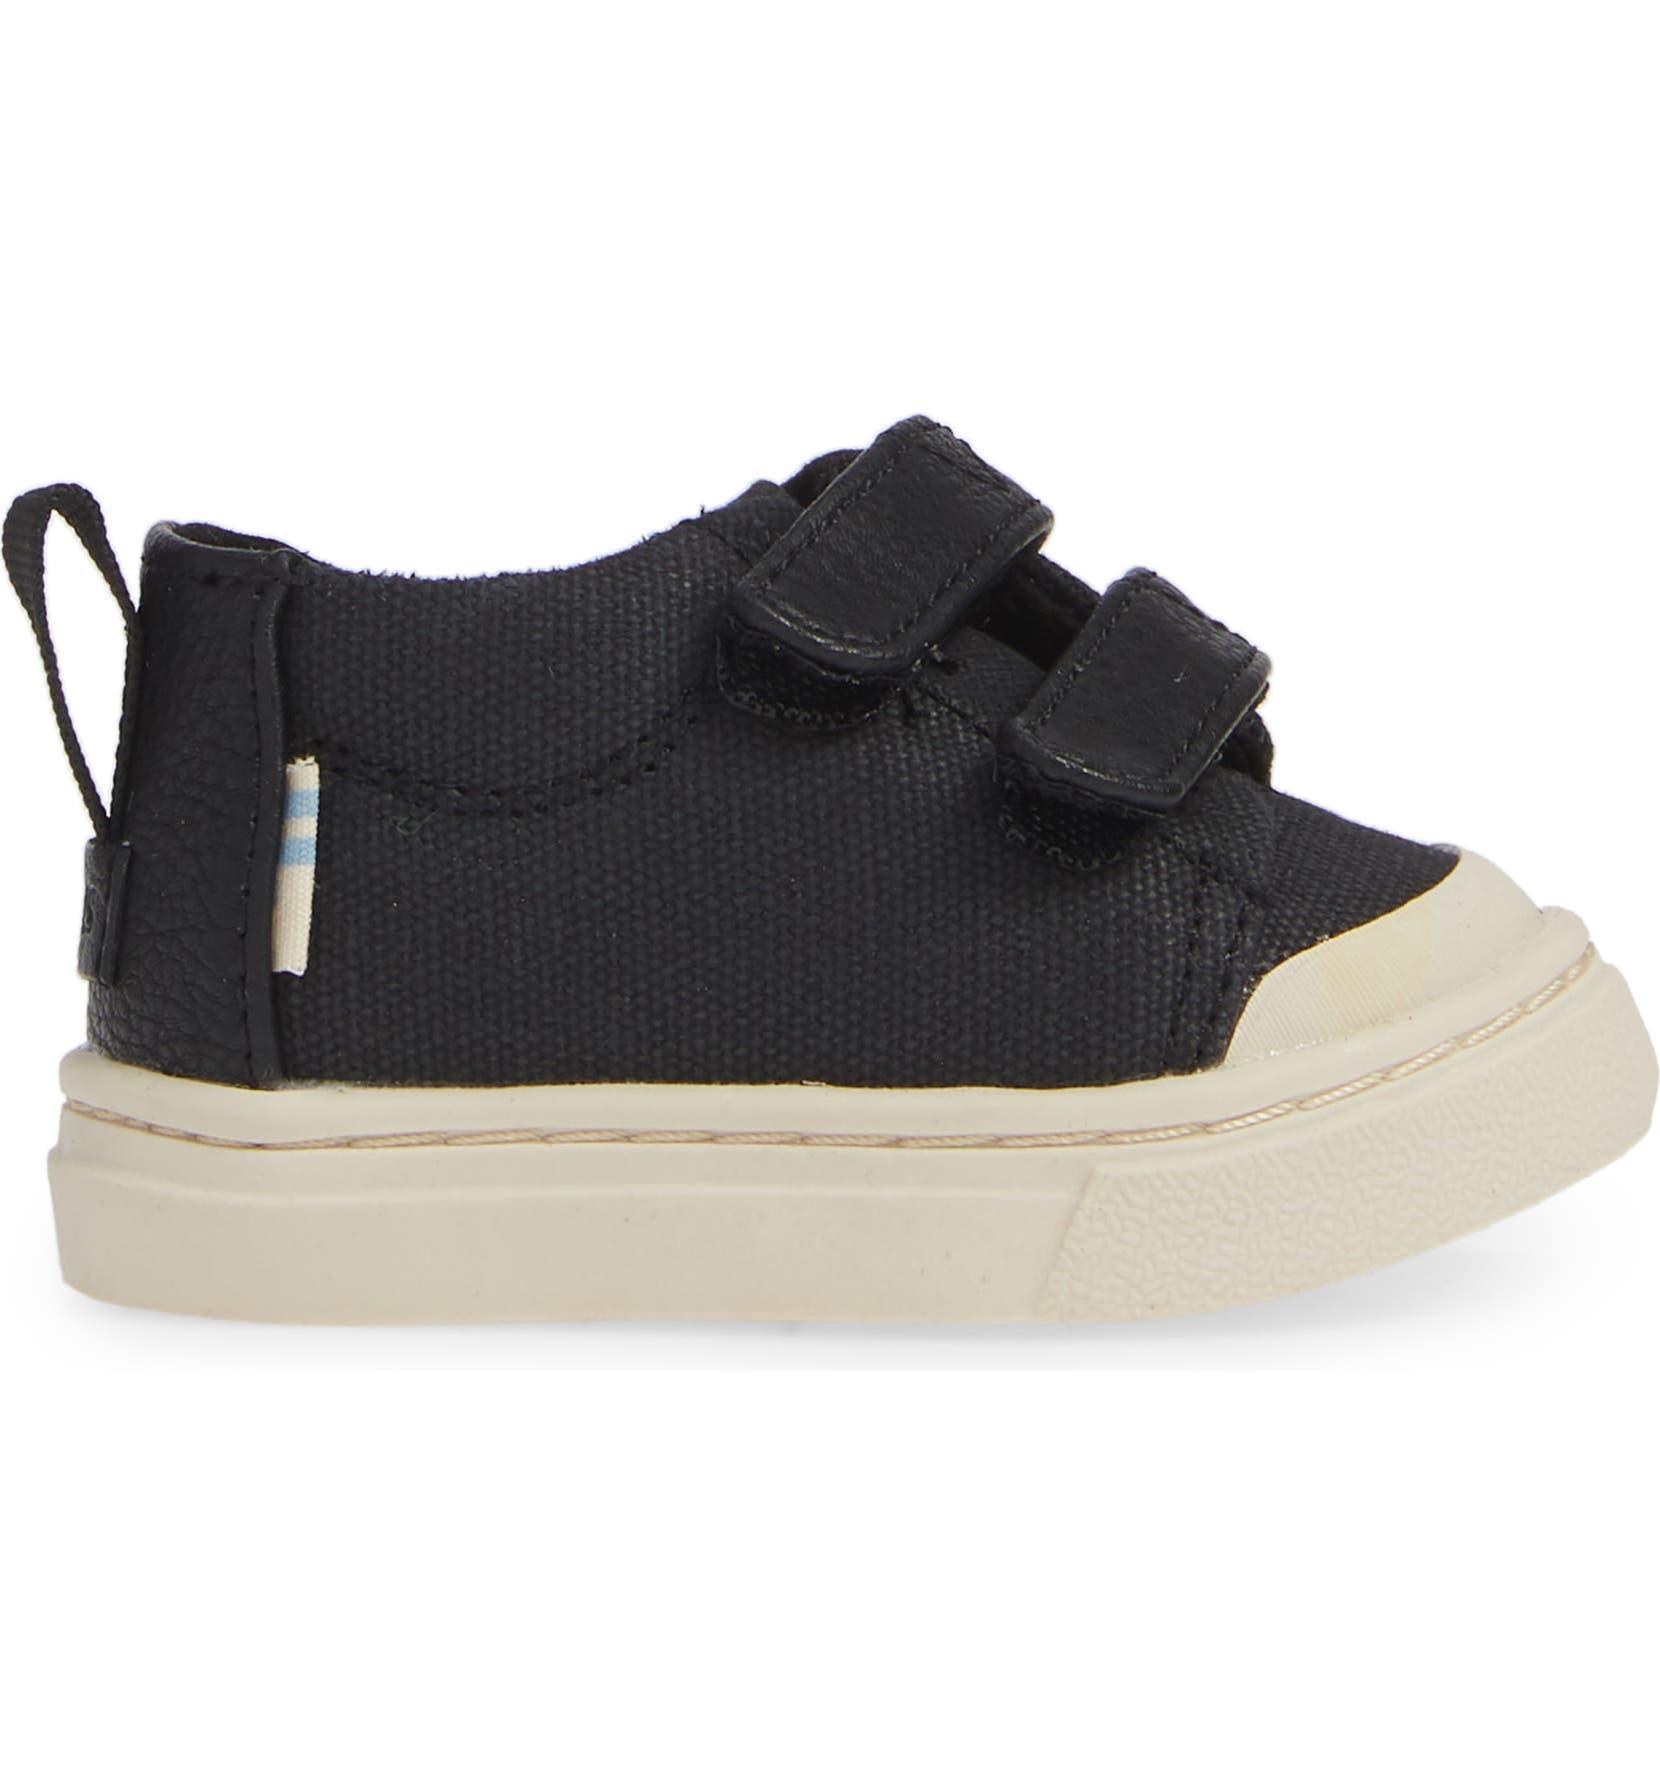 a5fbfcc8c59 TOMS Lenny Mid Top Sneaker (Baby, Walker & Toddler) | Nordstrom